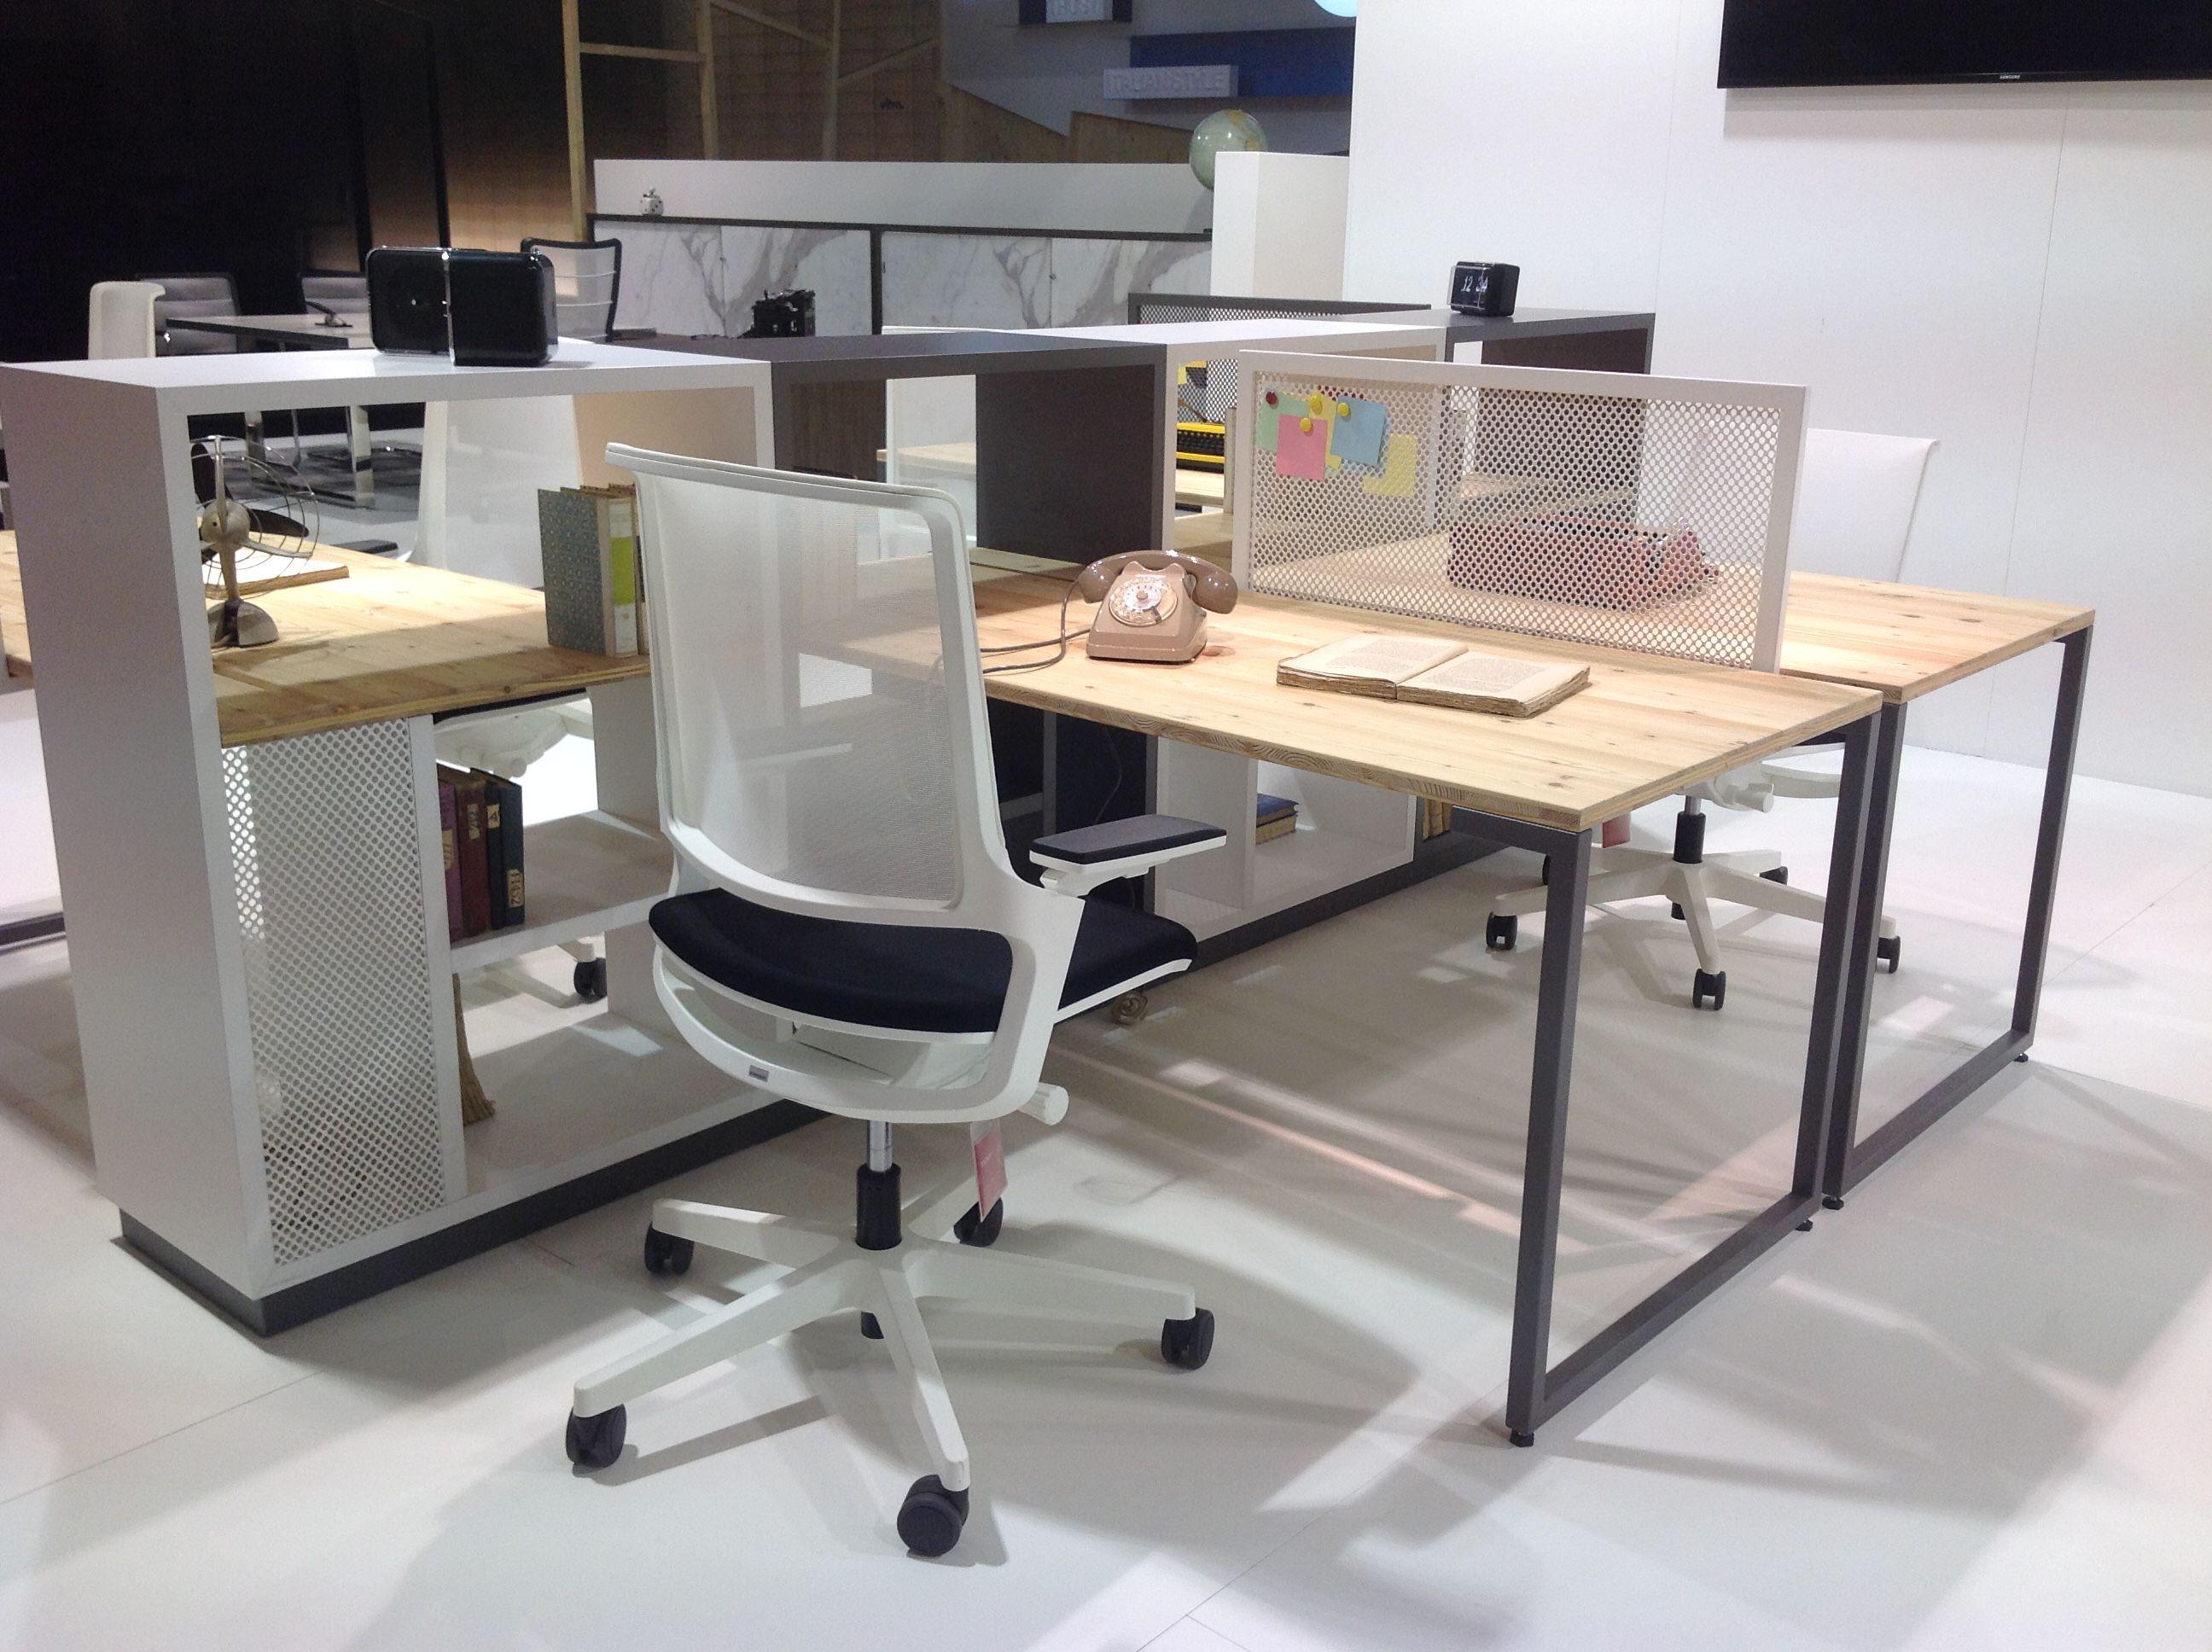 Office Furniture By Design Interiors Corp ~ Alea furniture design corporate interiors workspace